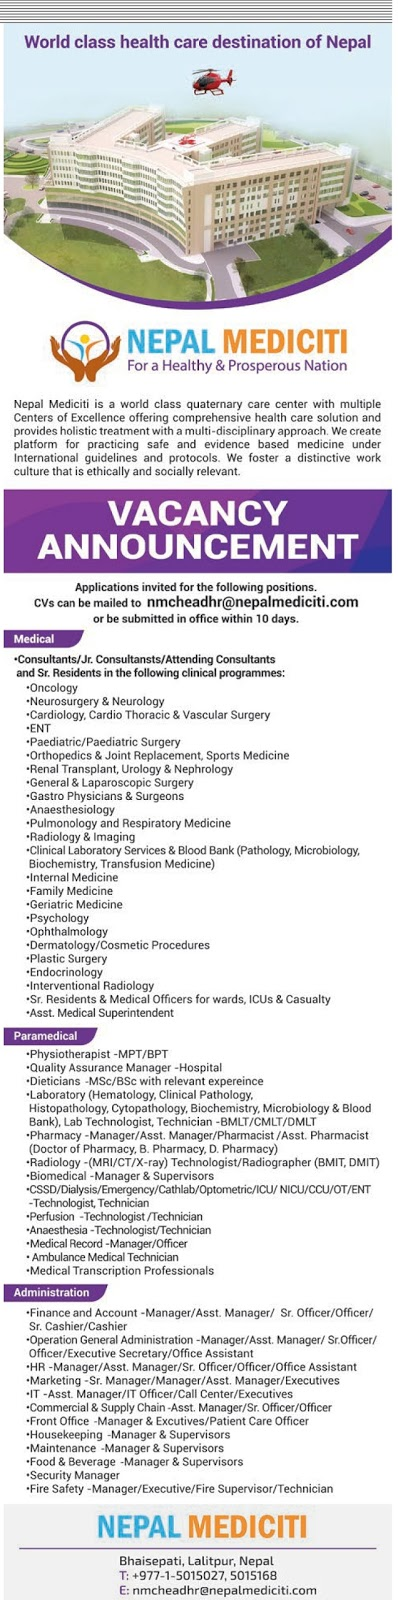 Multiple vacancies jobs at Nepal Mediciti Hospital